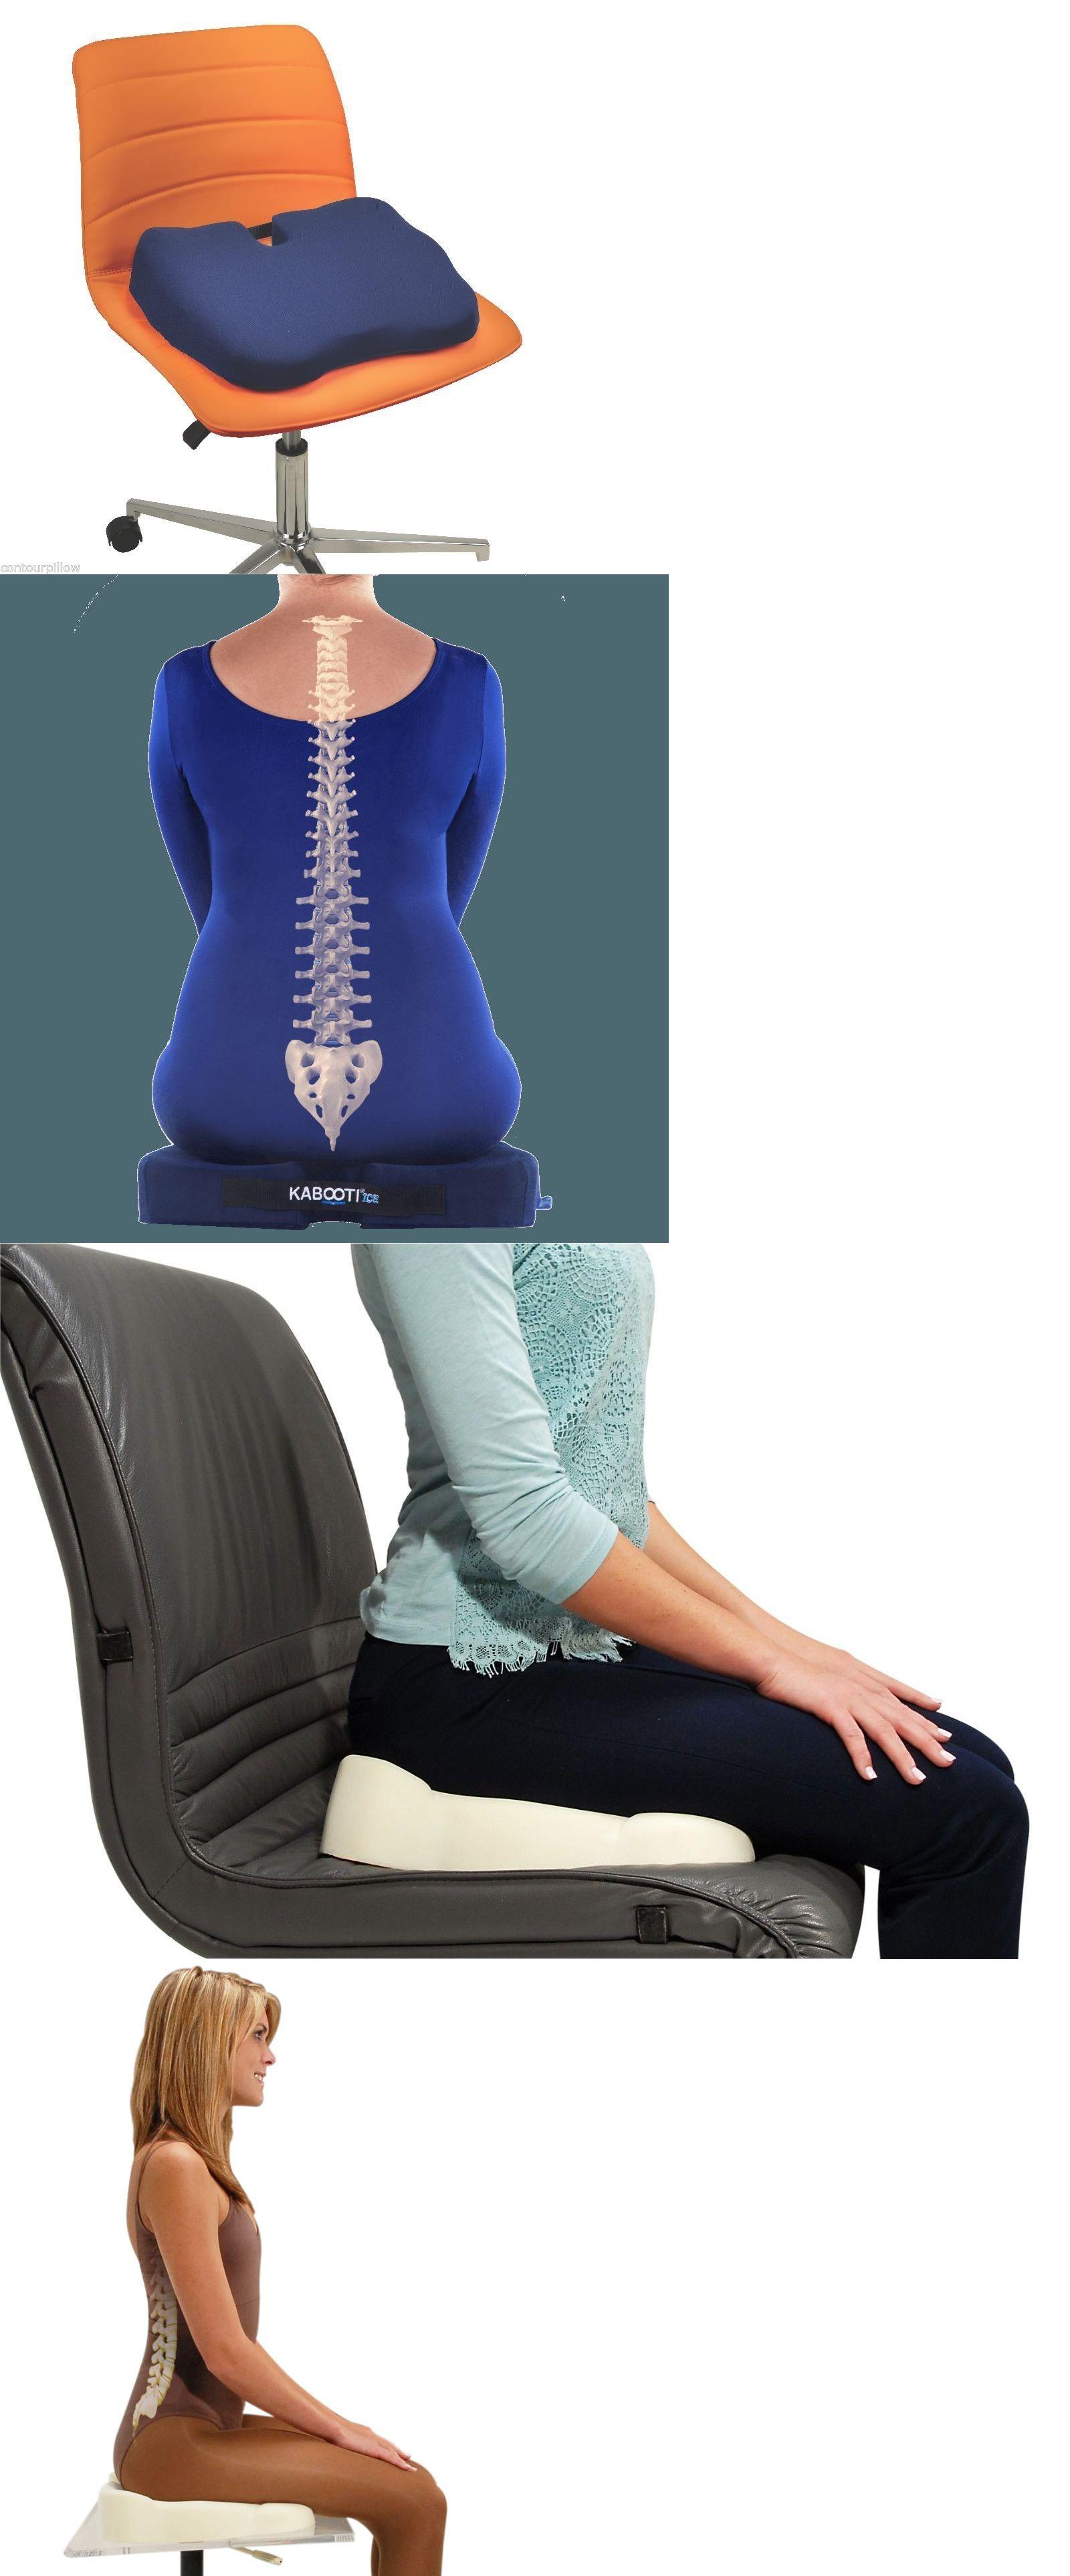 Online store and network of orthopedic salons Ortokomfort